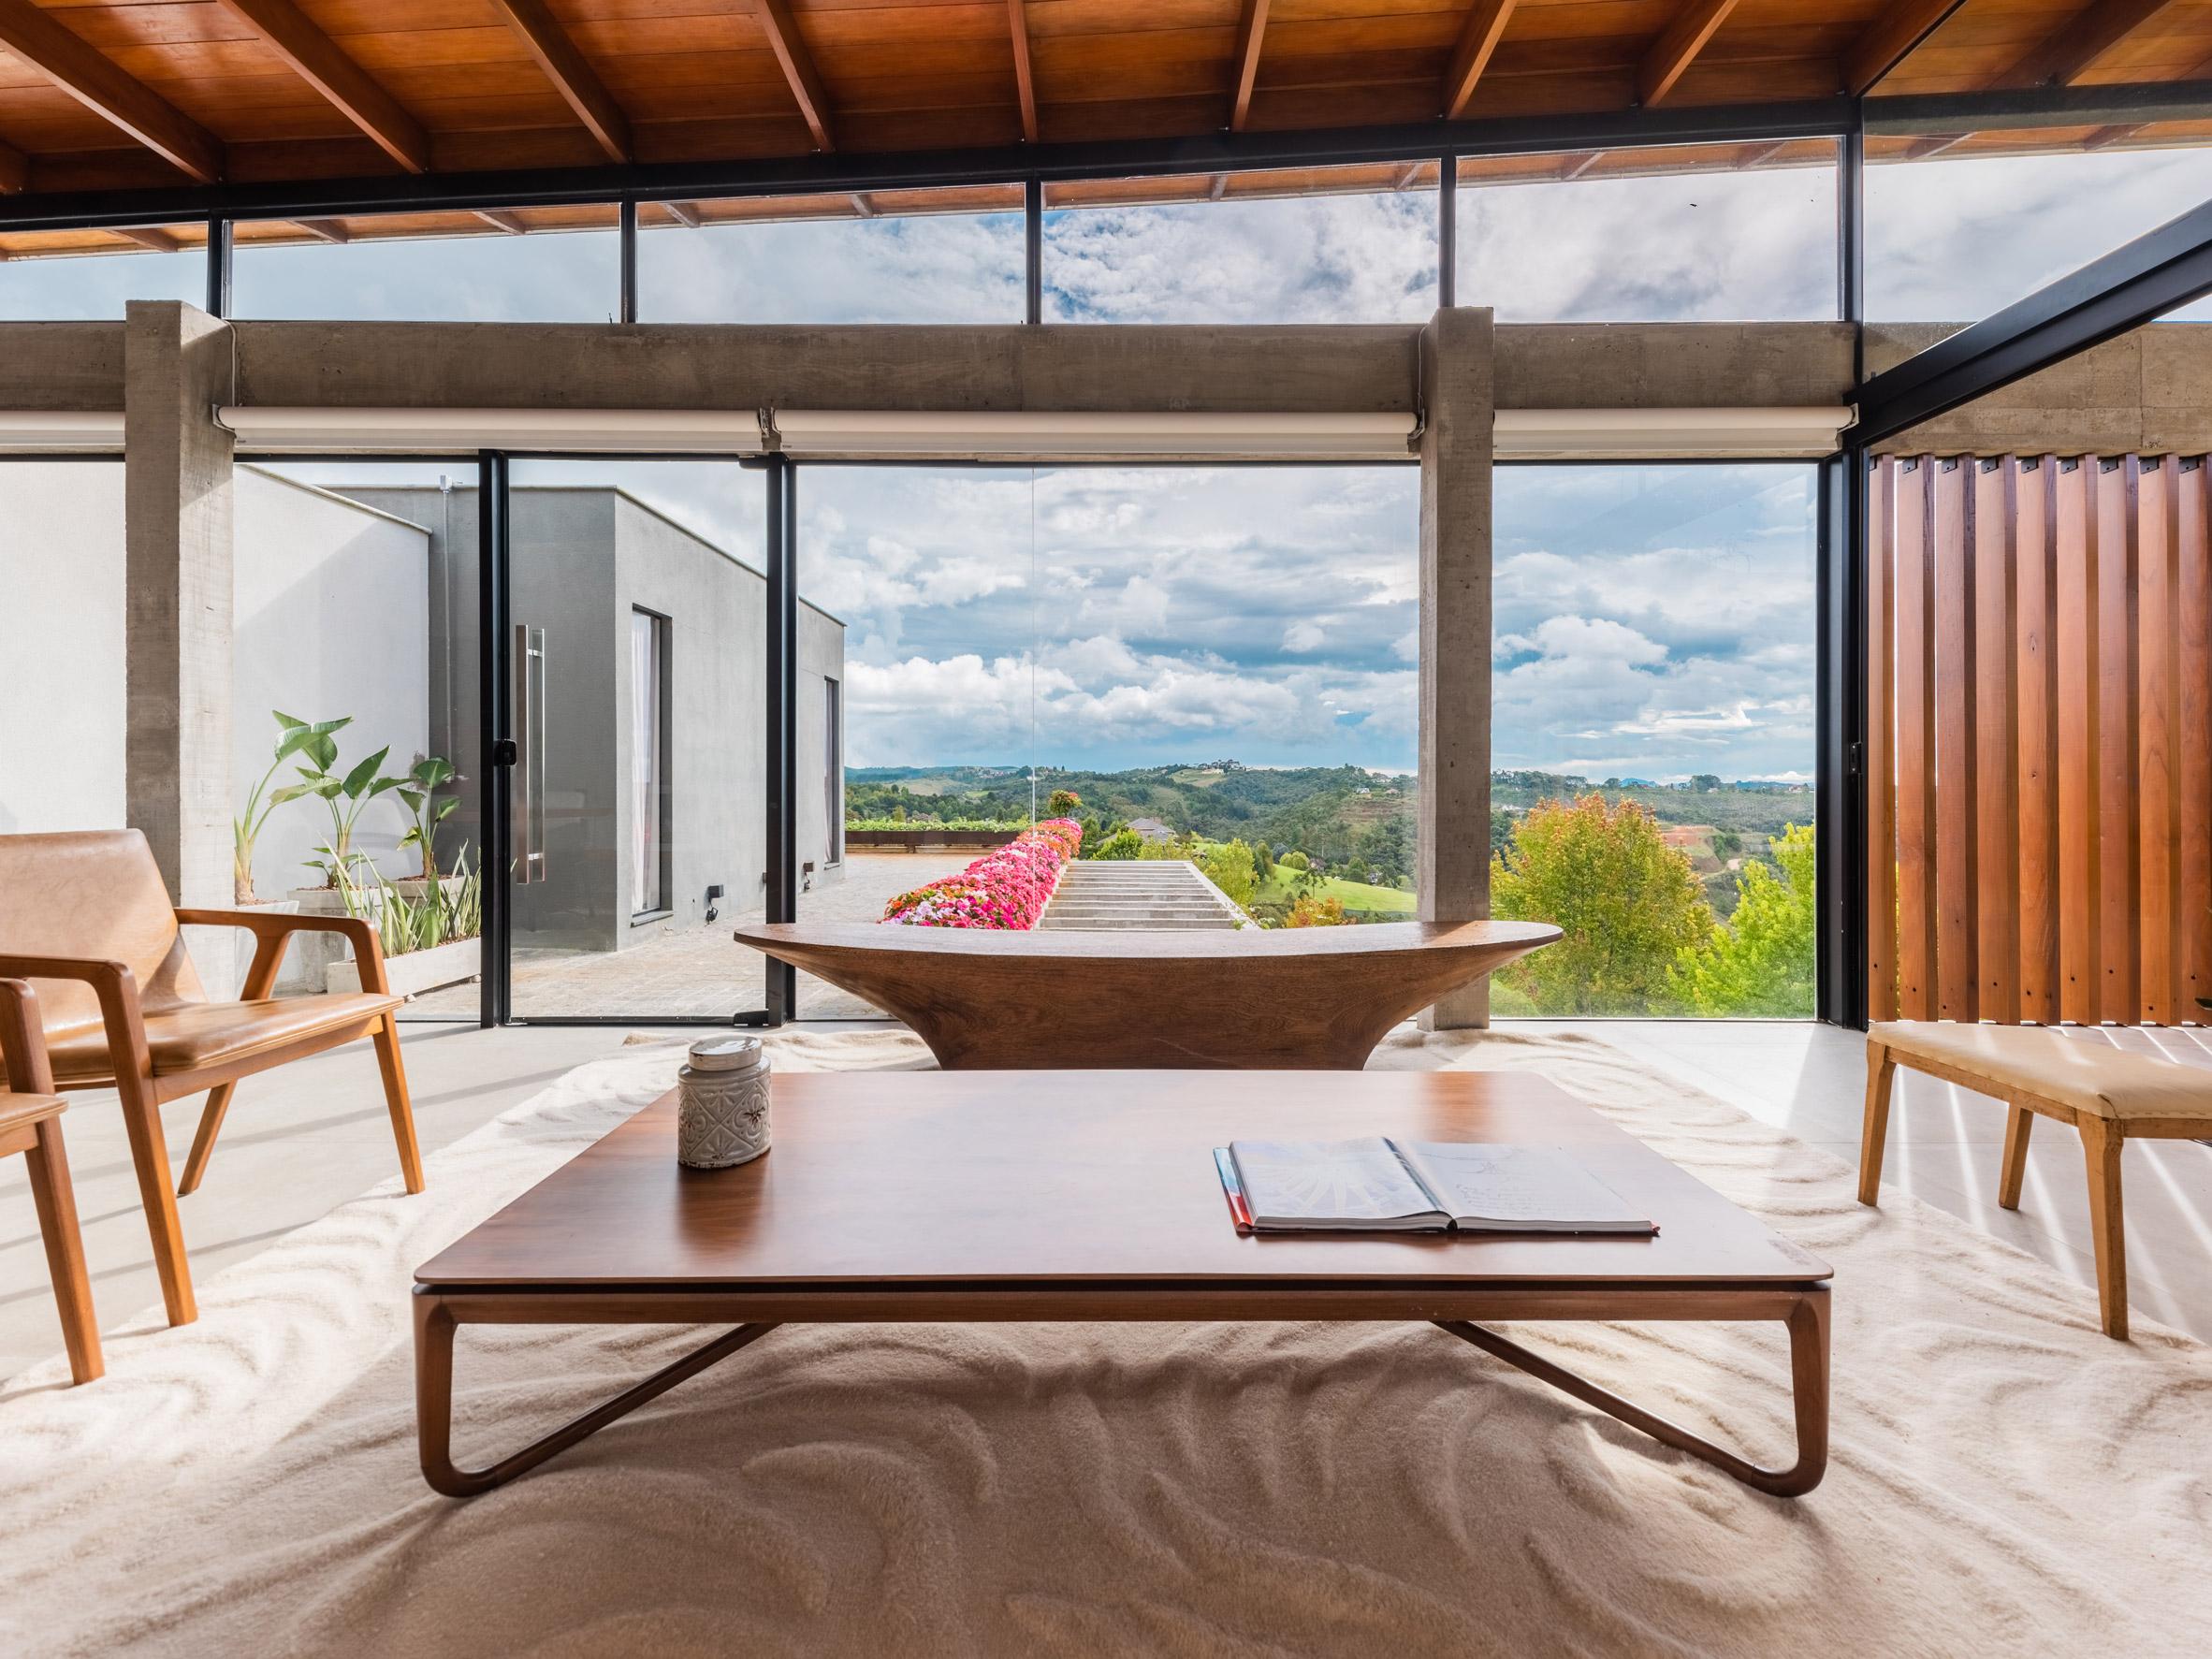 Living room views from OTP Arquitetura House in Brazil